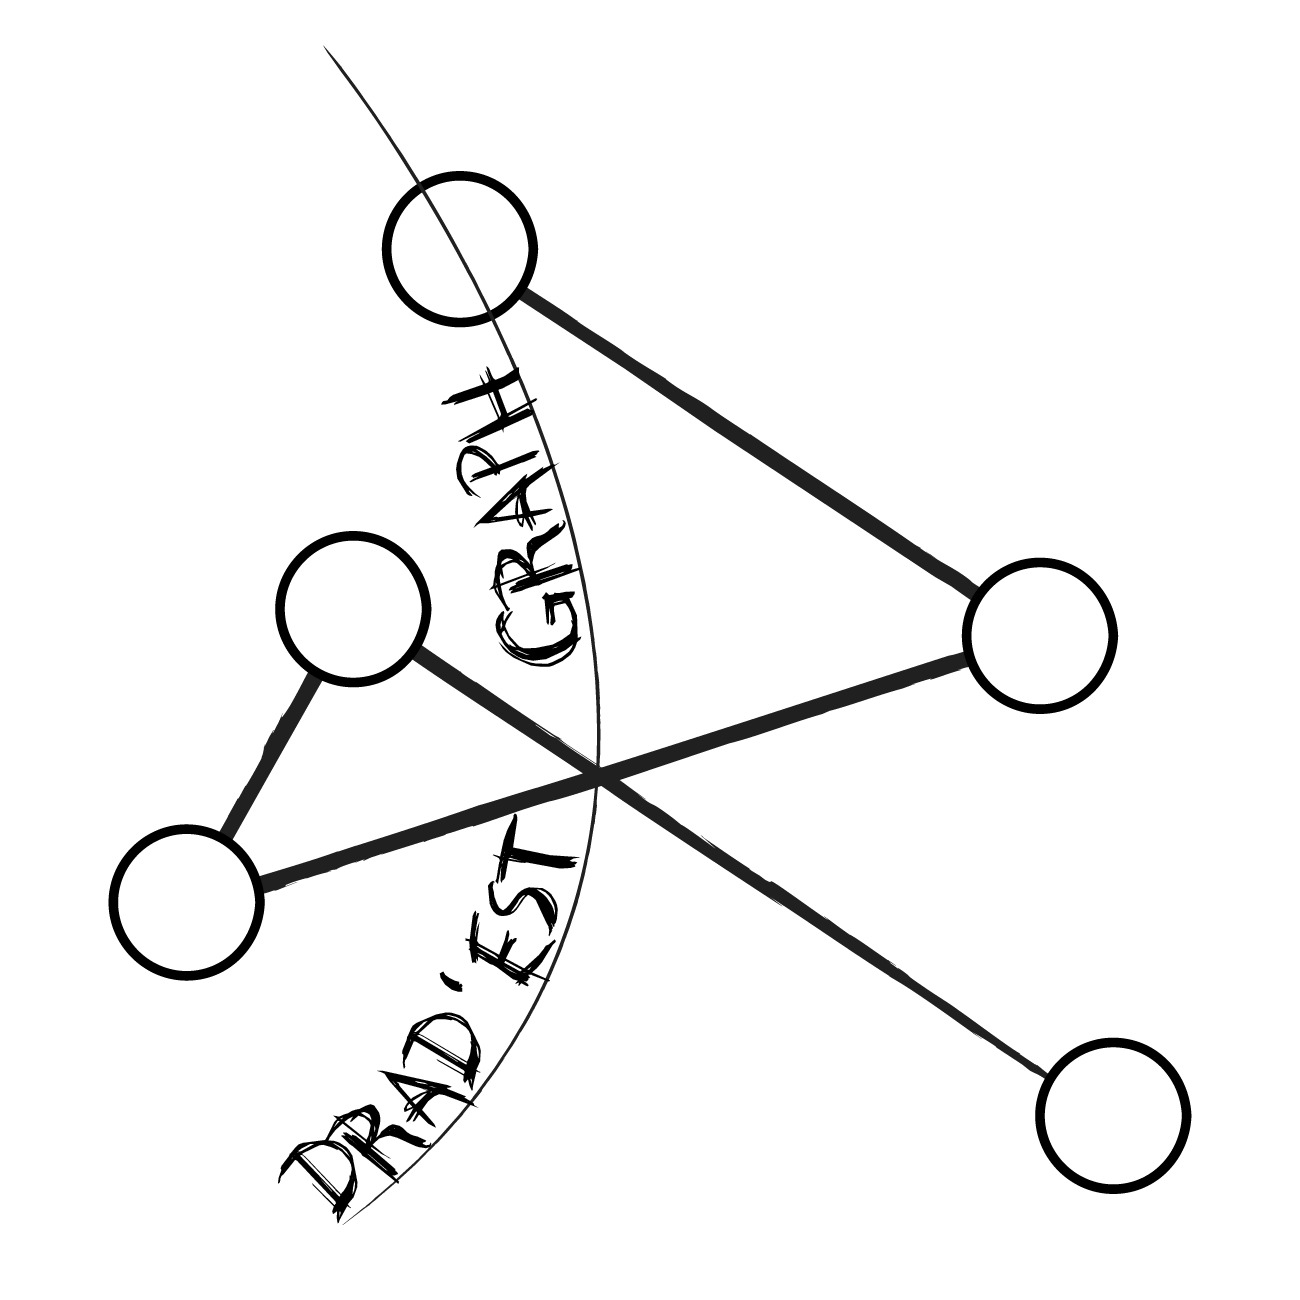 dradestGraph